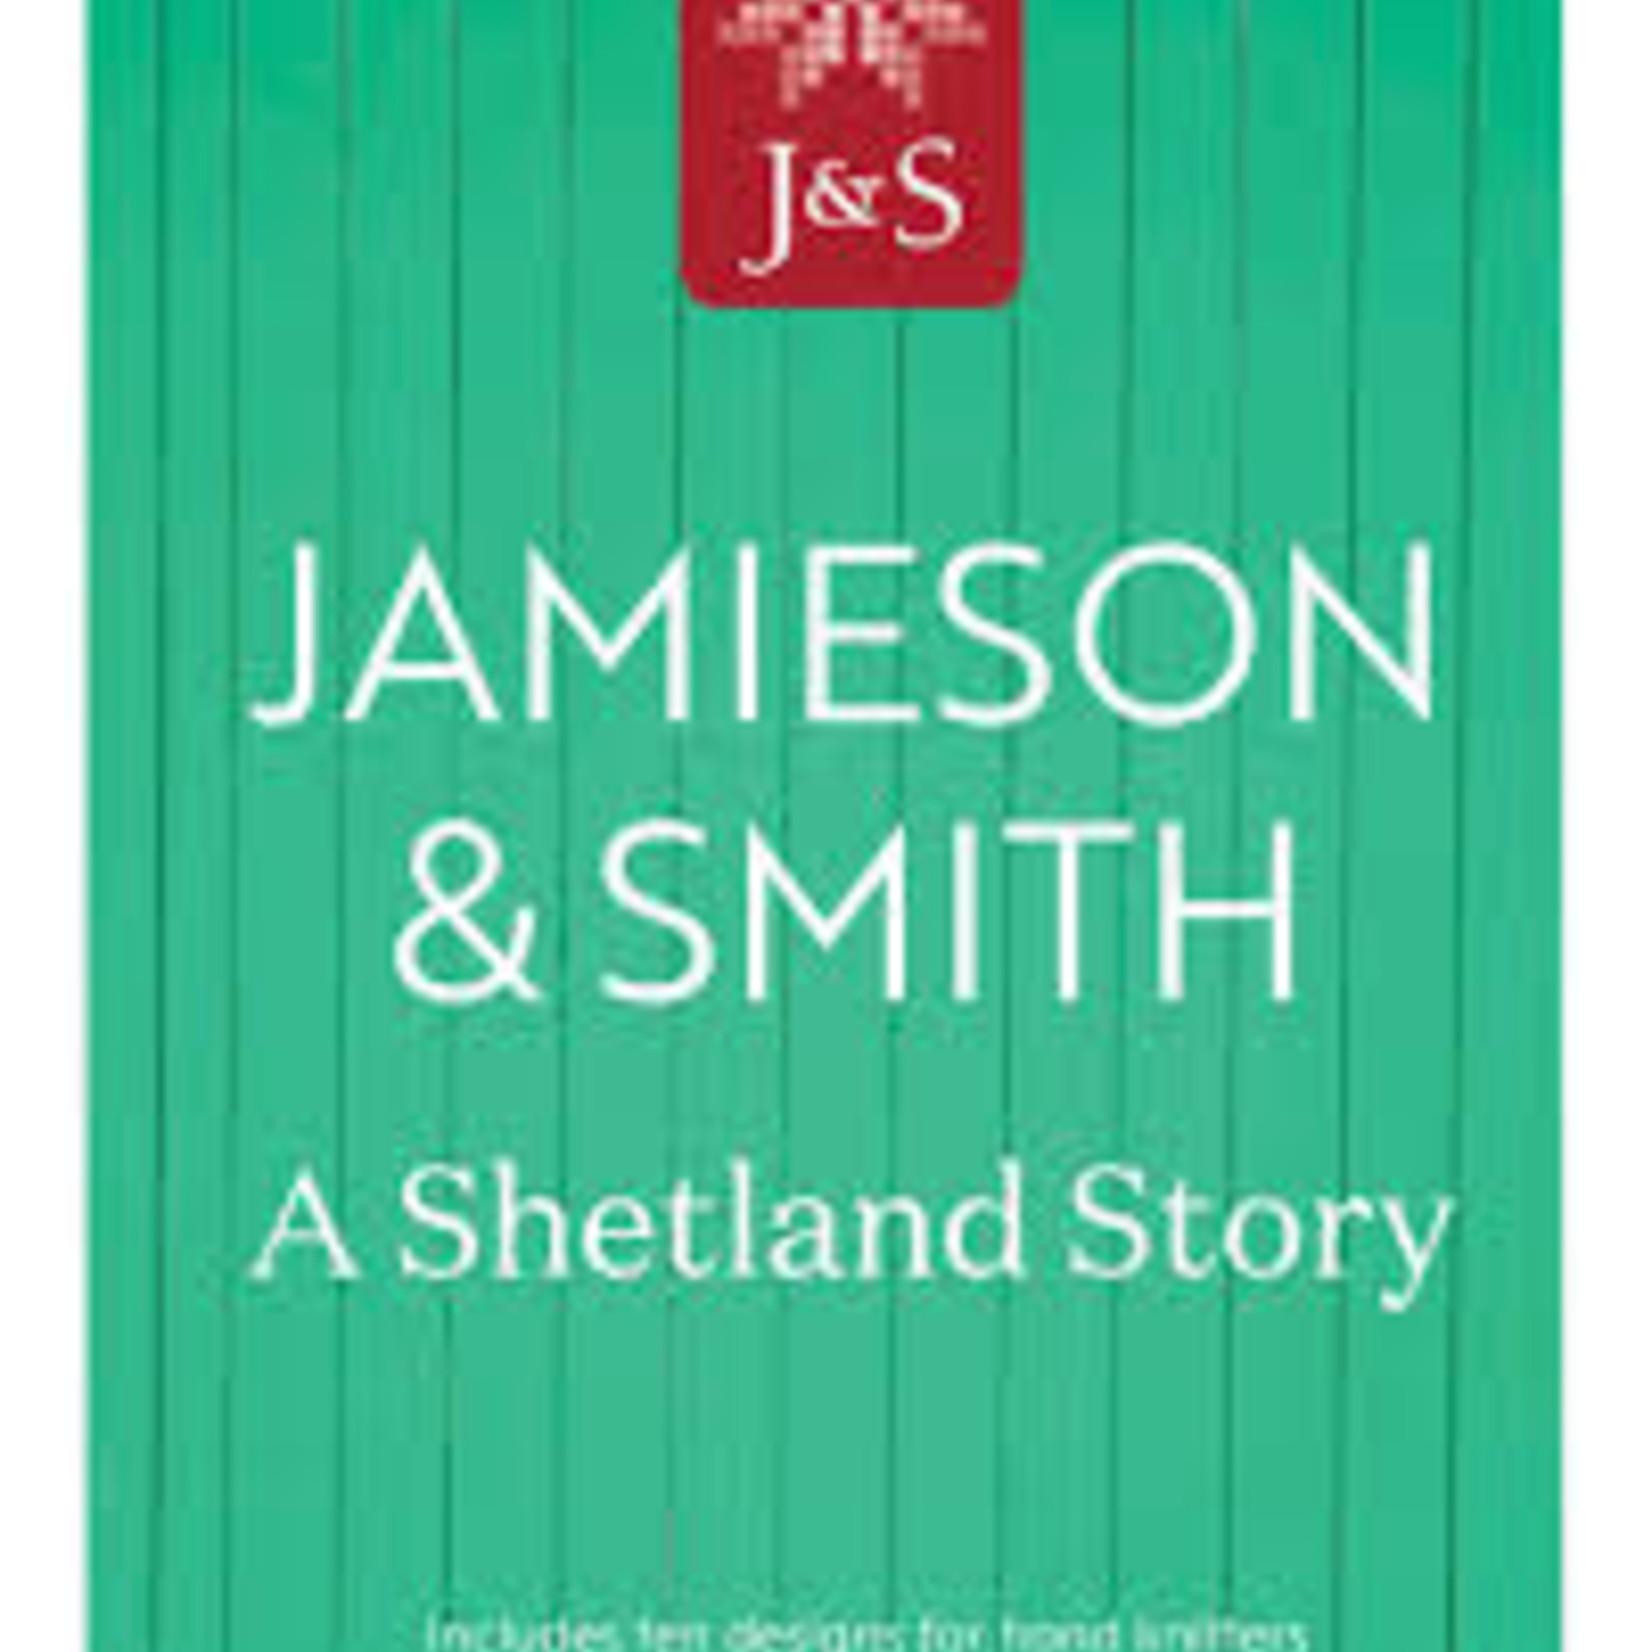 Jamieson & Smith : A Shetland Story - Knitting Magazine with Patterns